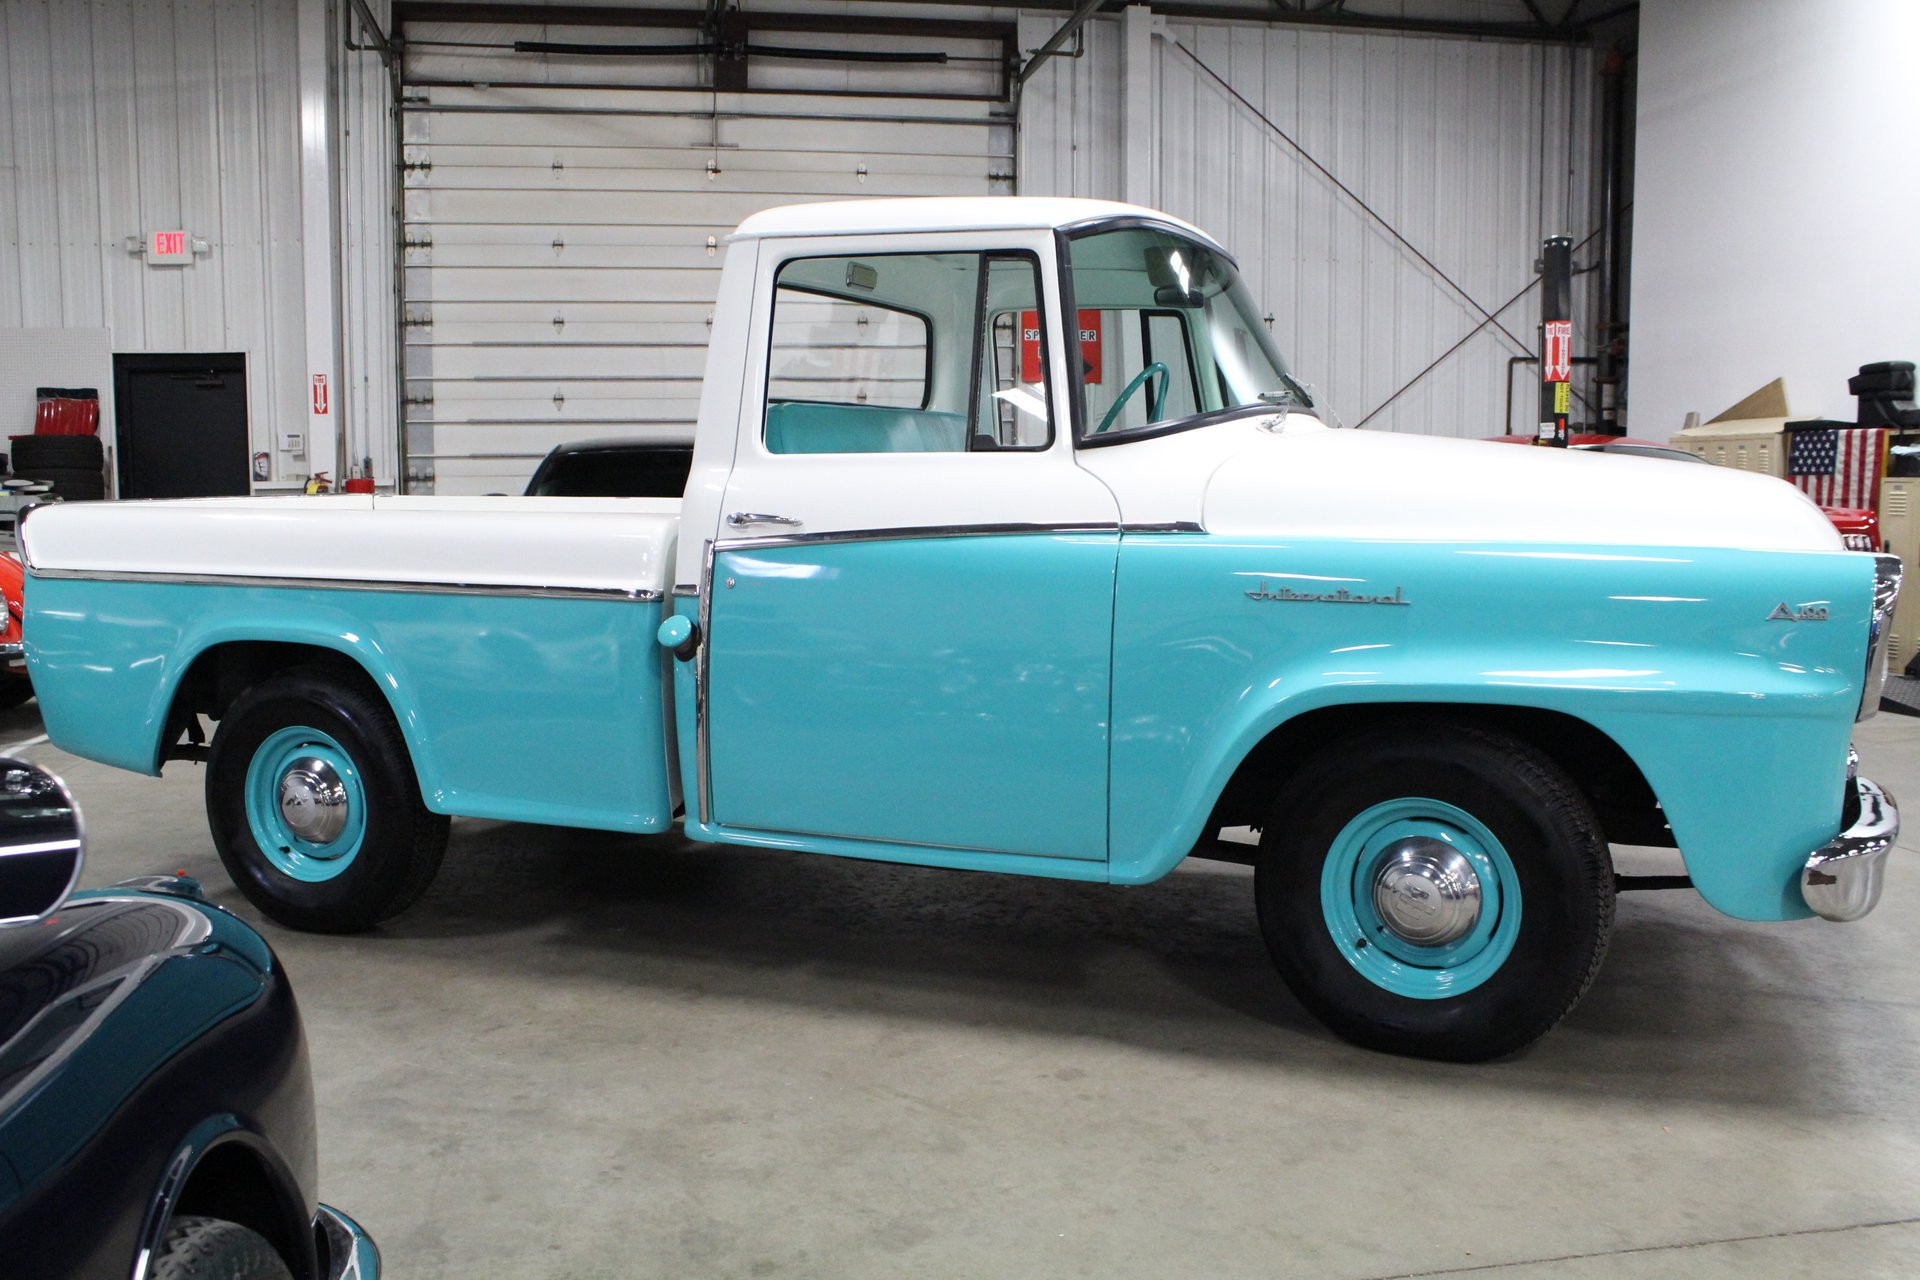 1957 International A-100 for sale #110151 | MCG